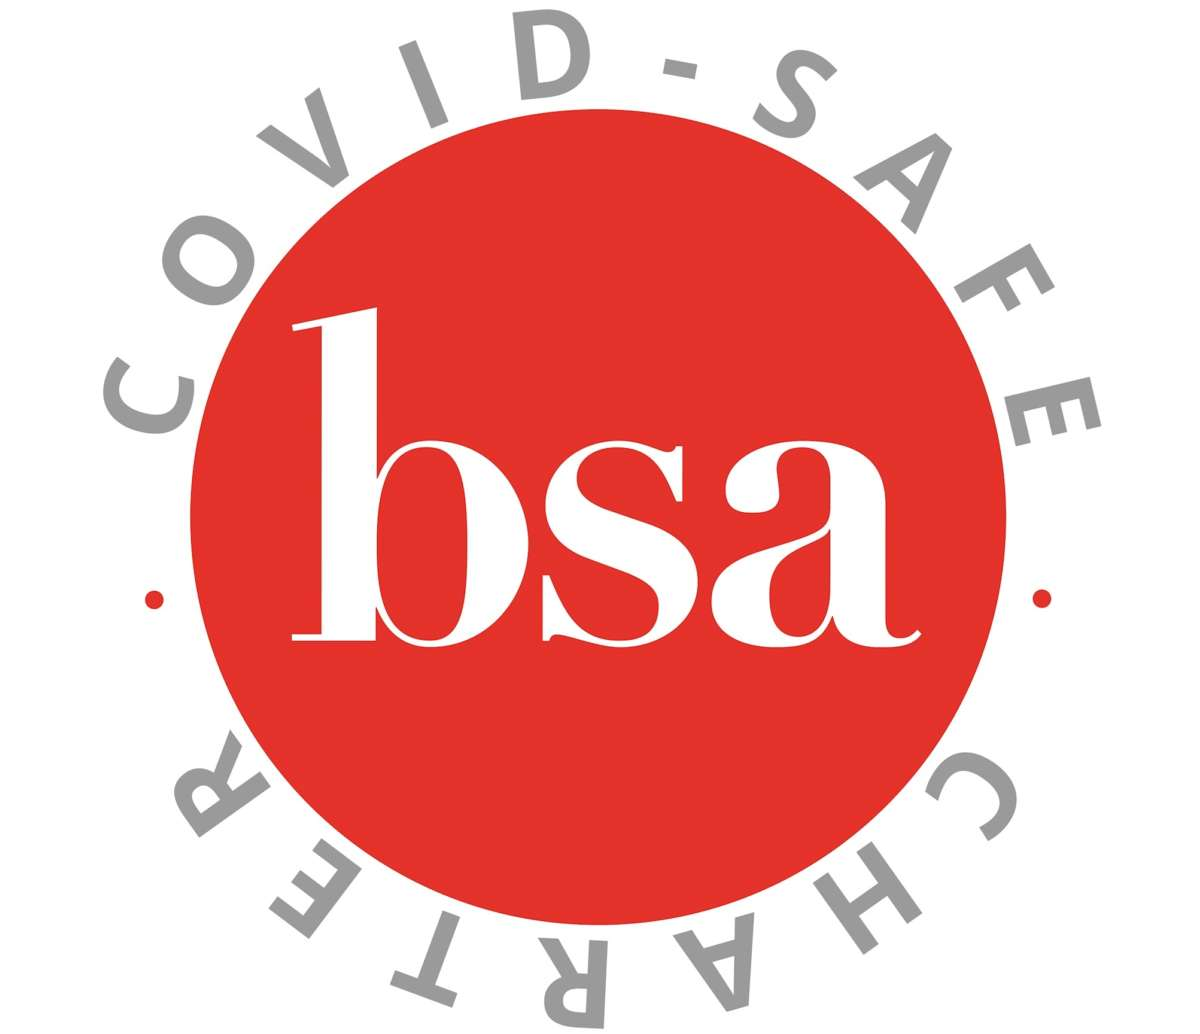 Bsa Covid Safe Charter Logo